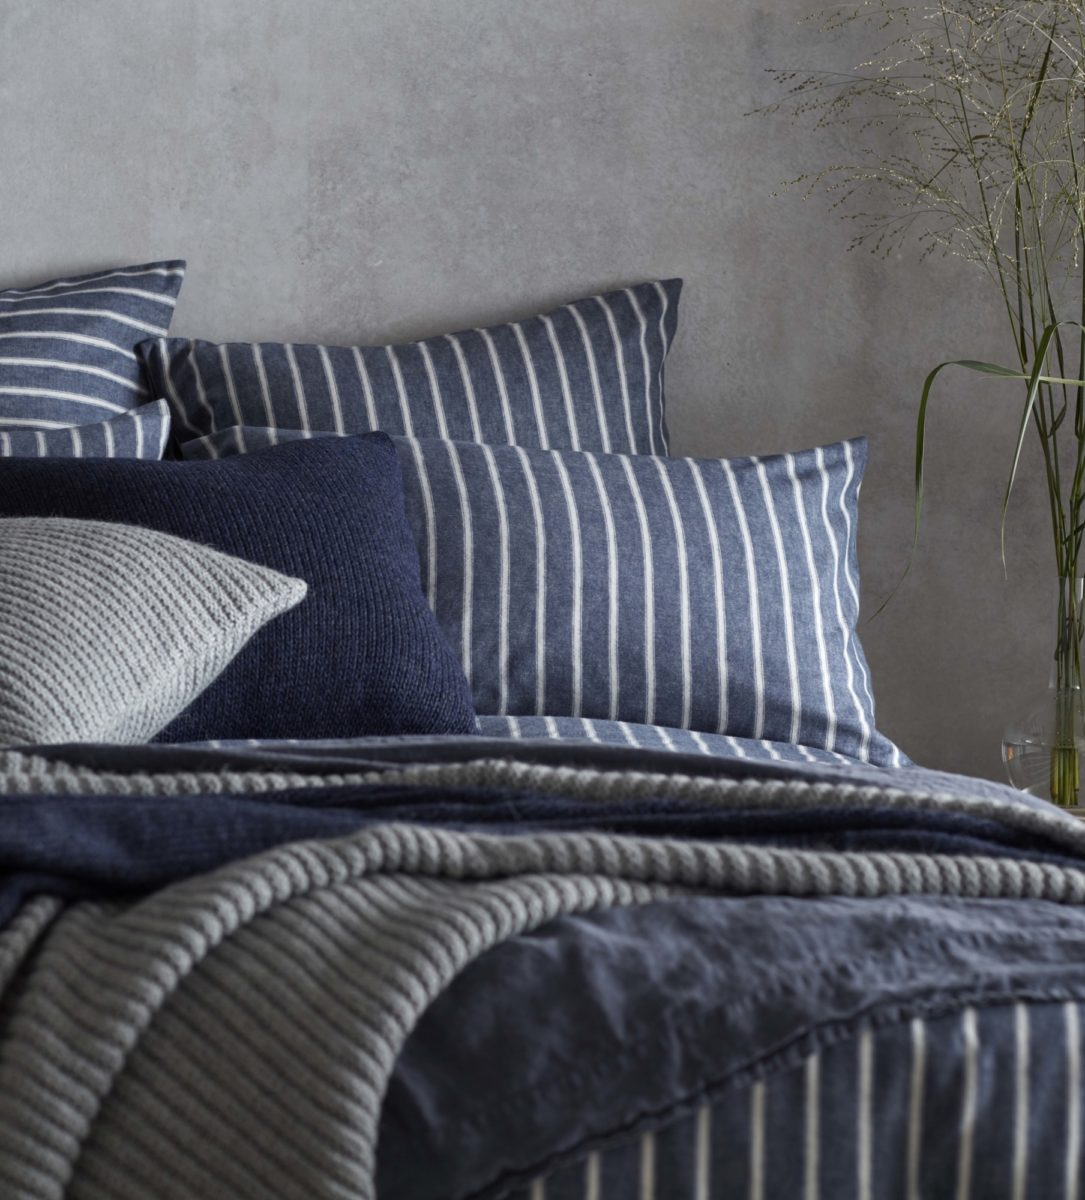 Ticking Stripe Blue Pillowcase | Brushed Cotton | Secret Linen Store